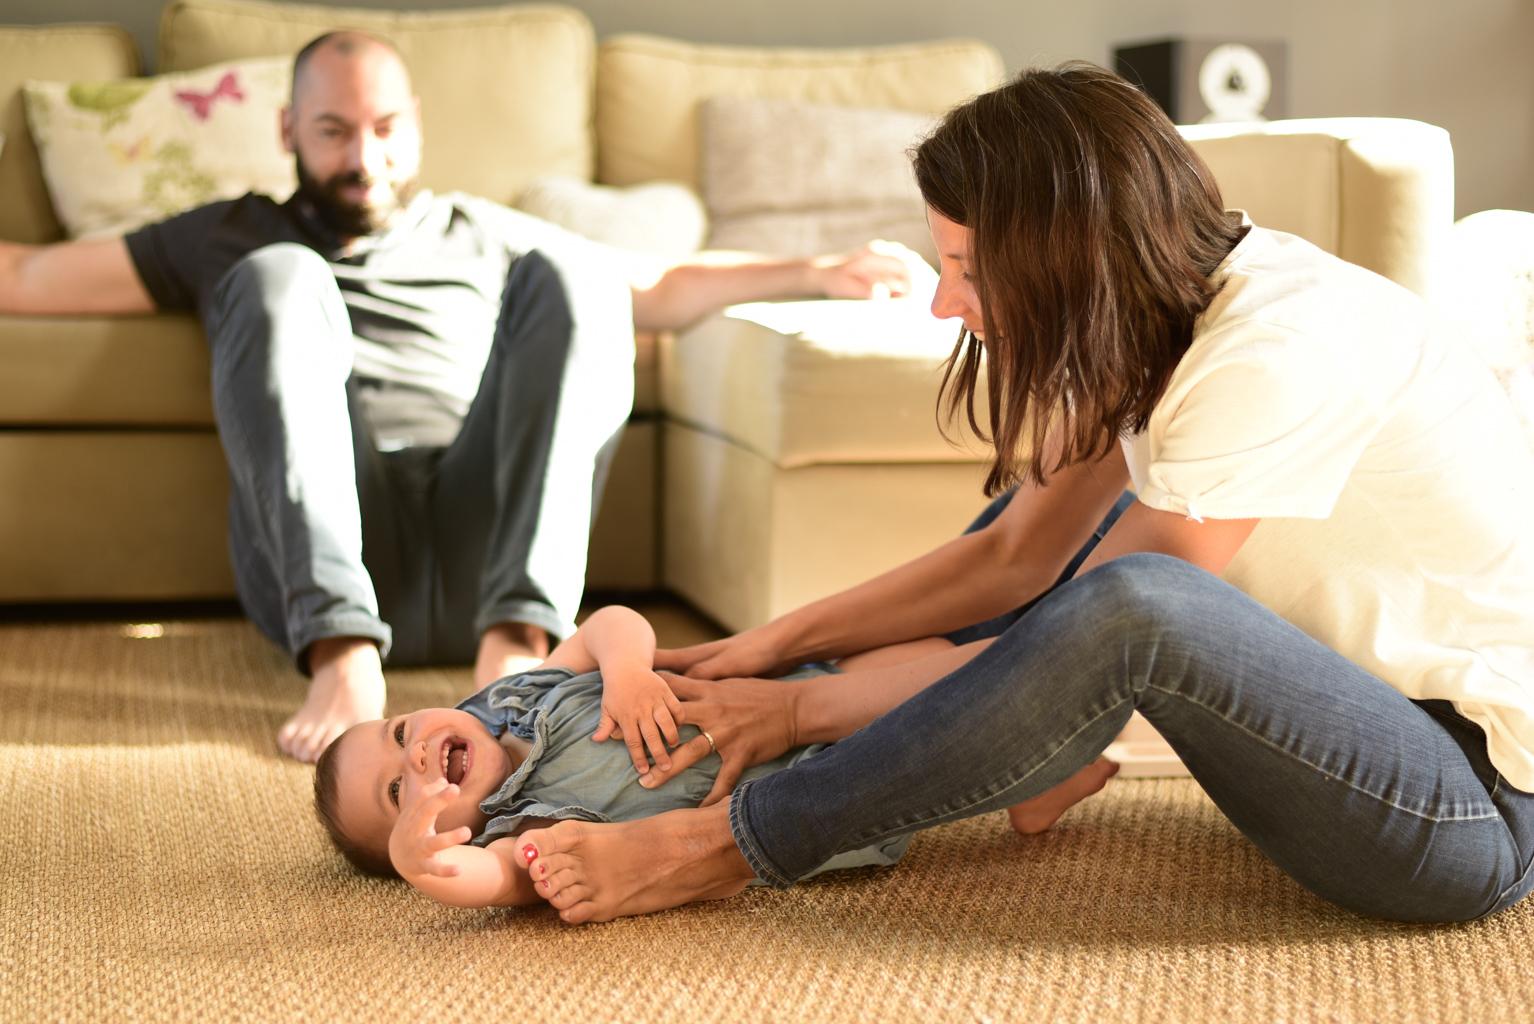 conseils séance photo, conseils, conseils séance famille, séance famille, photos famille, photographe famille, séance photo famille